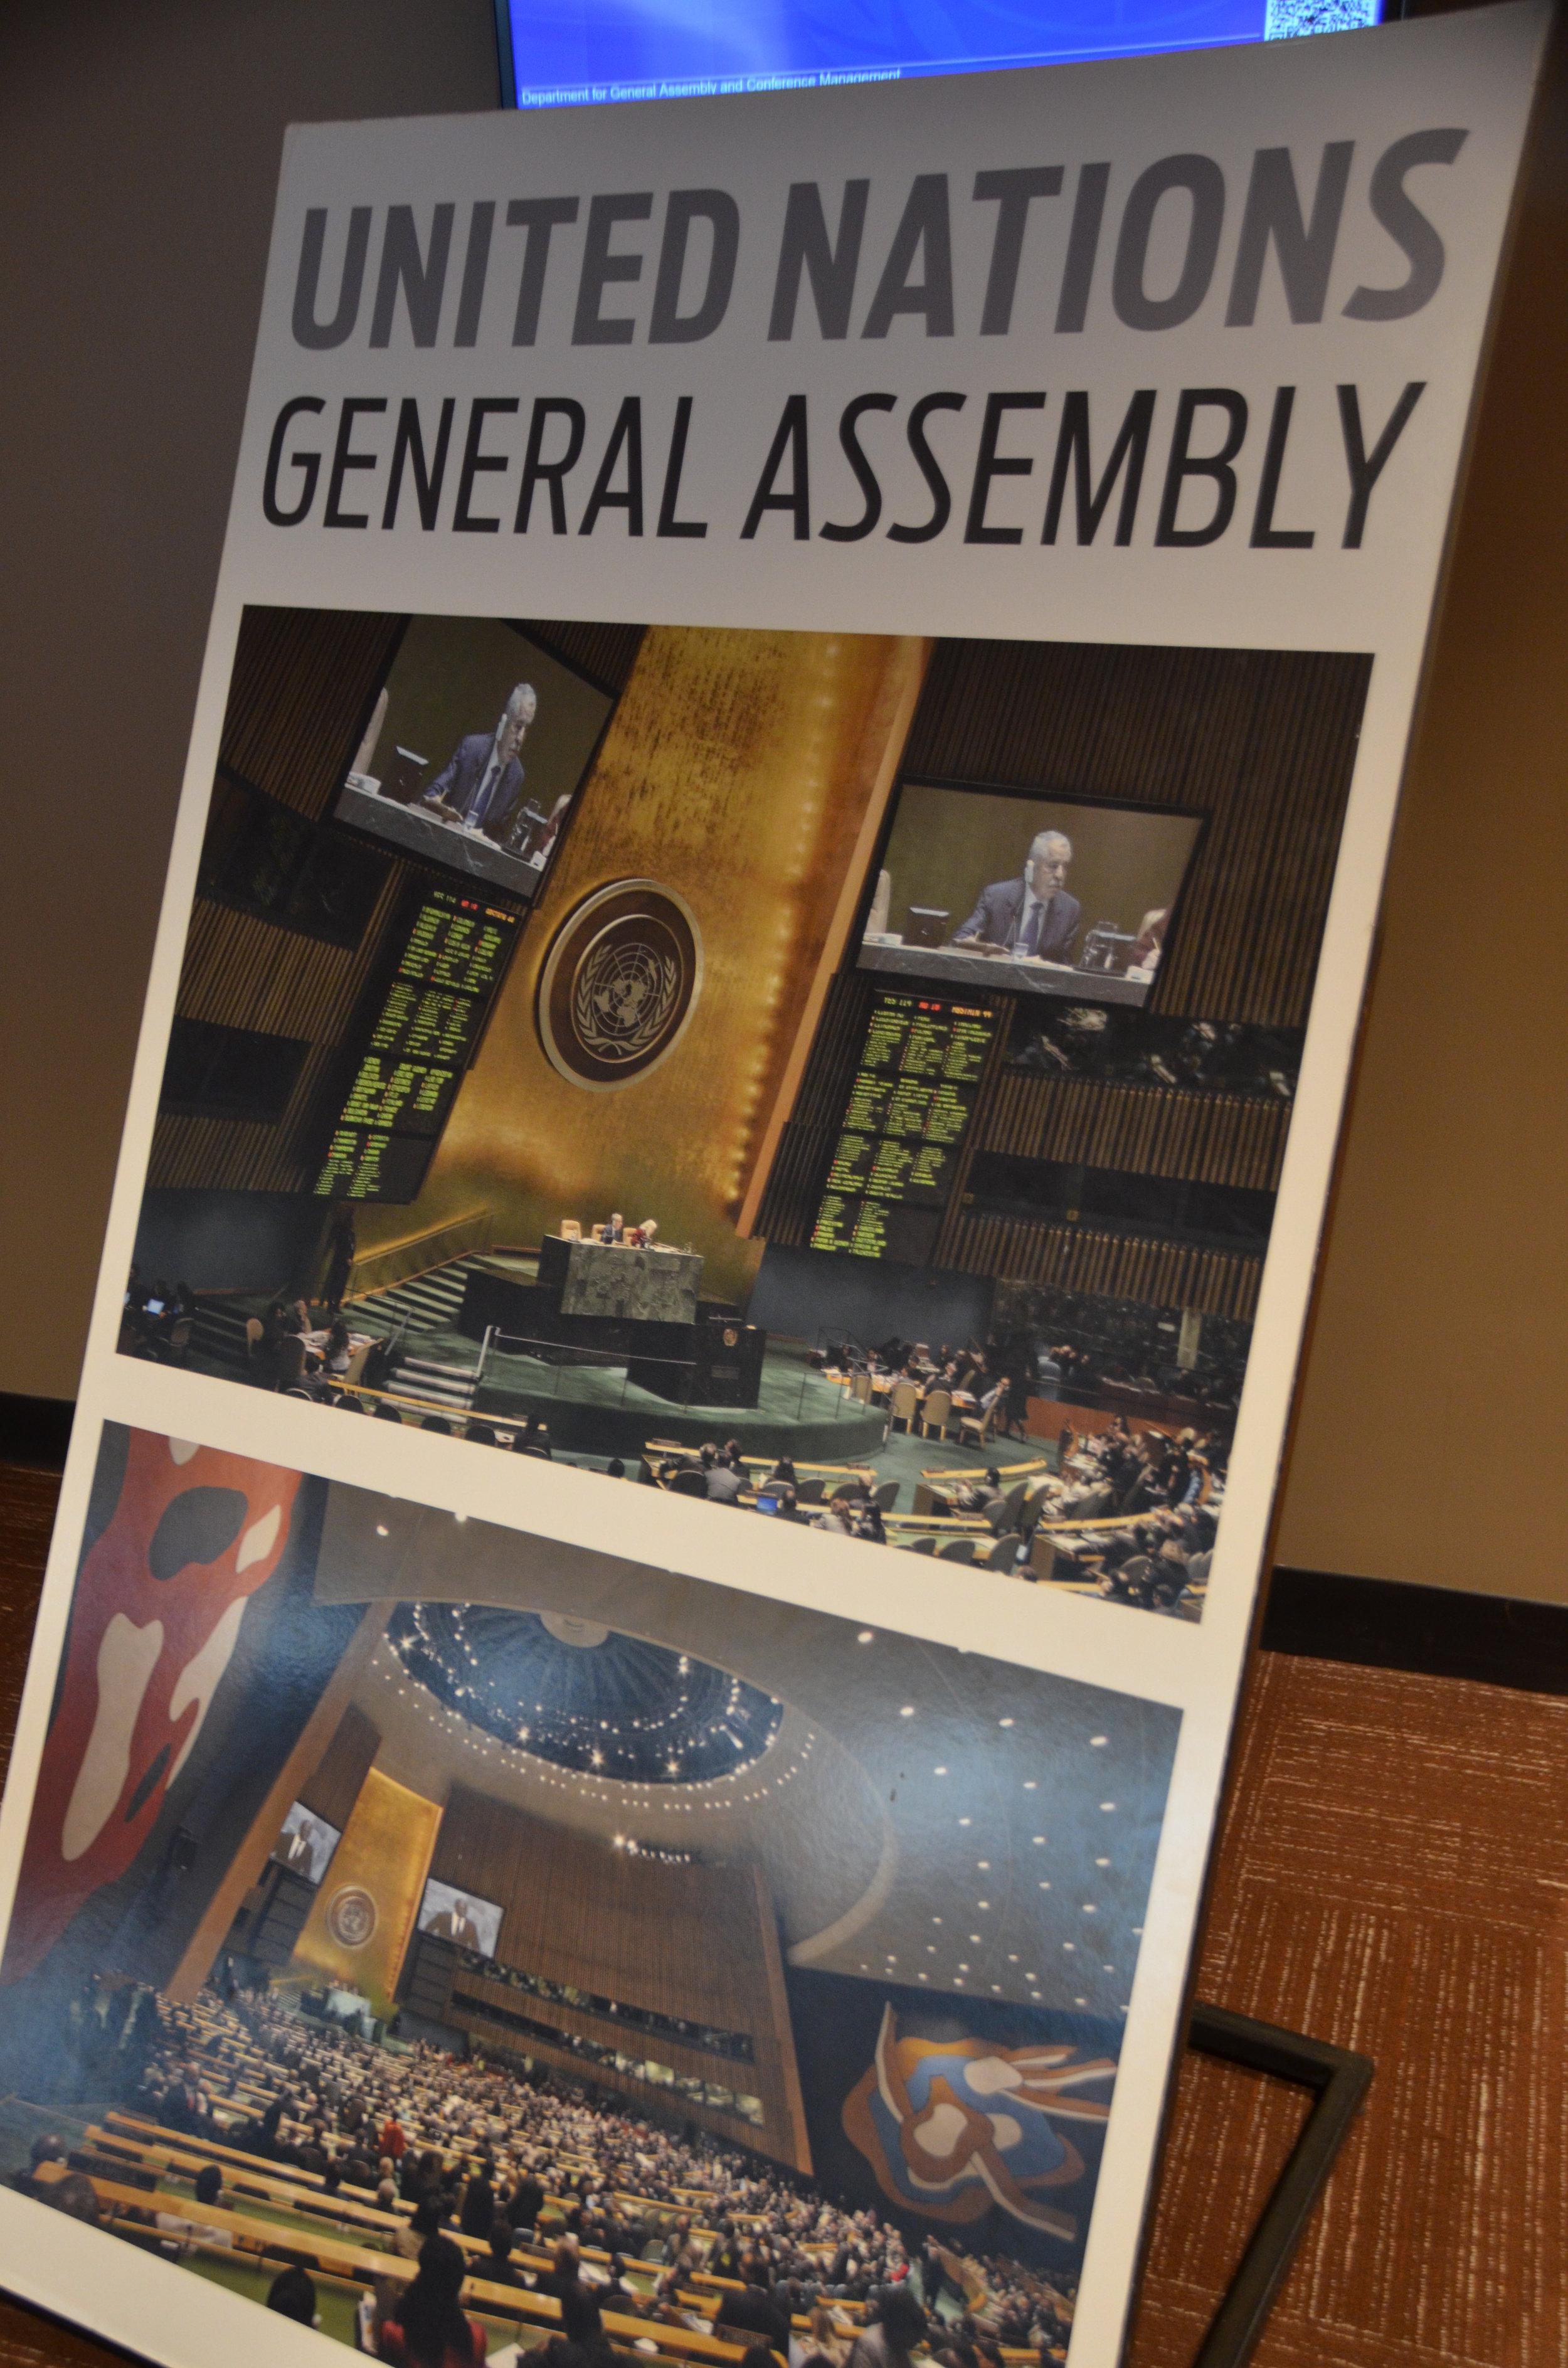 United Nations.jpg